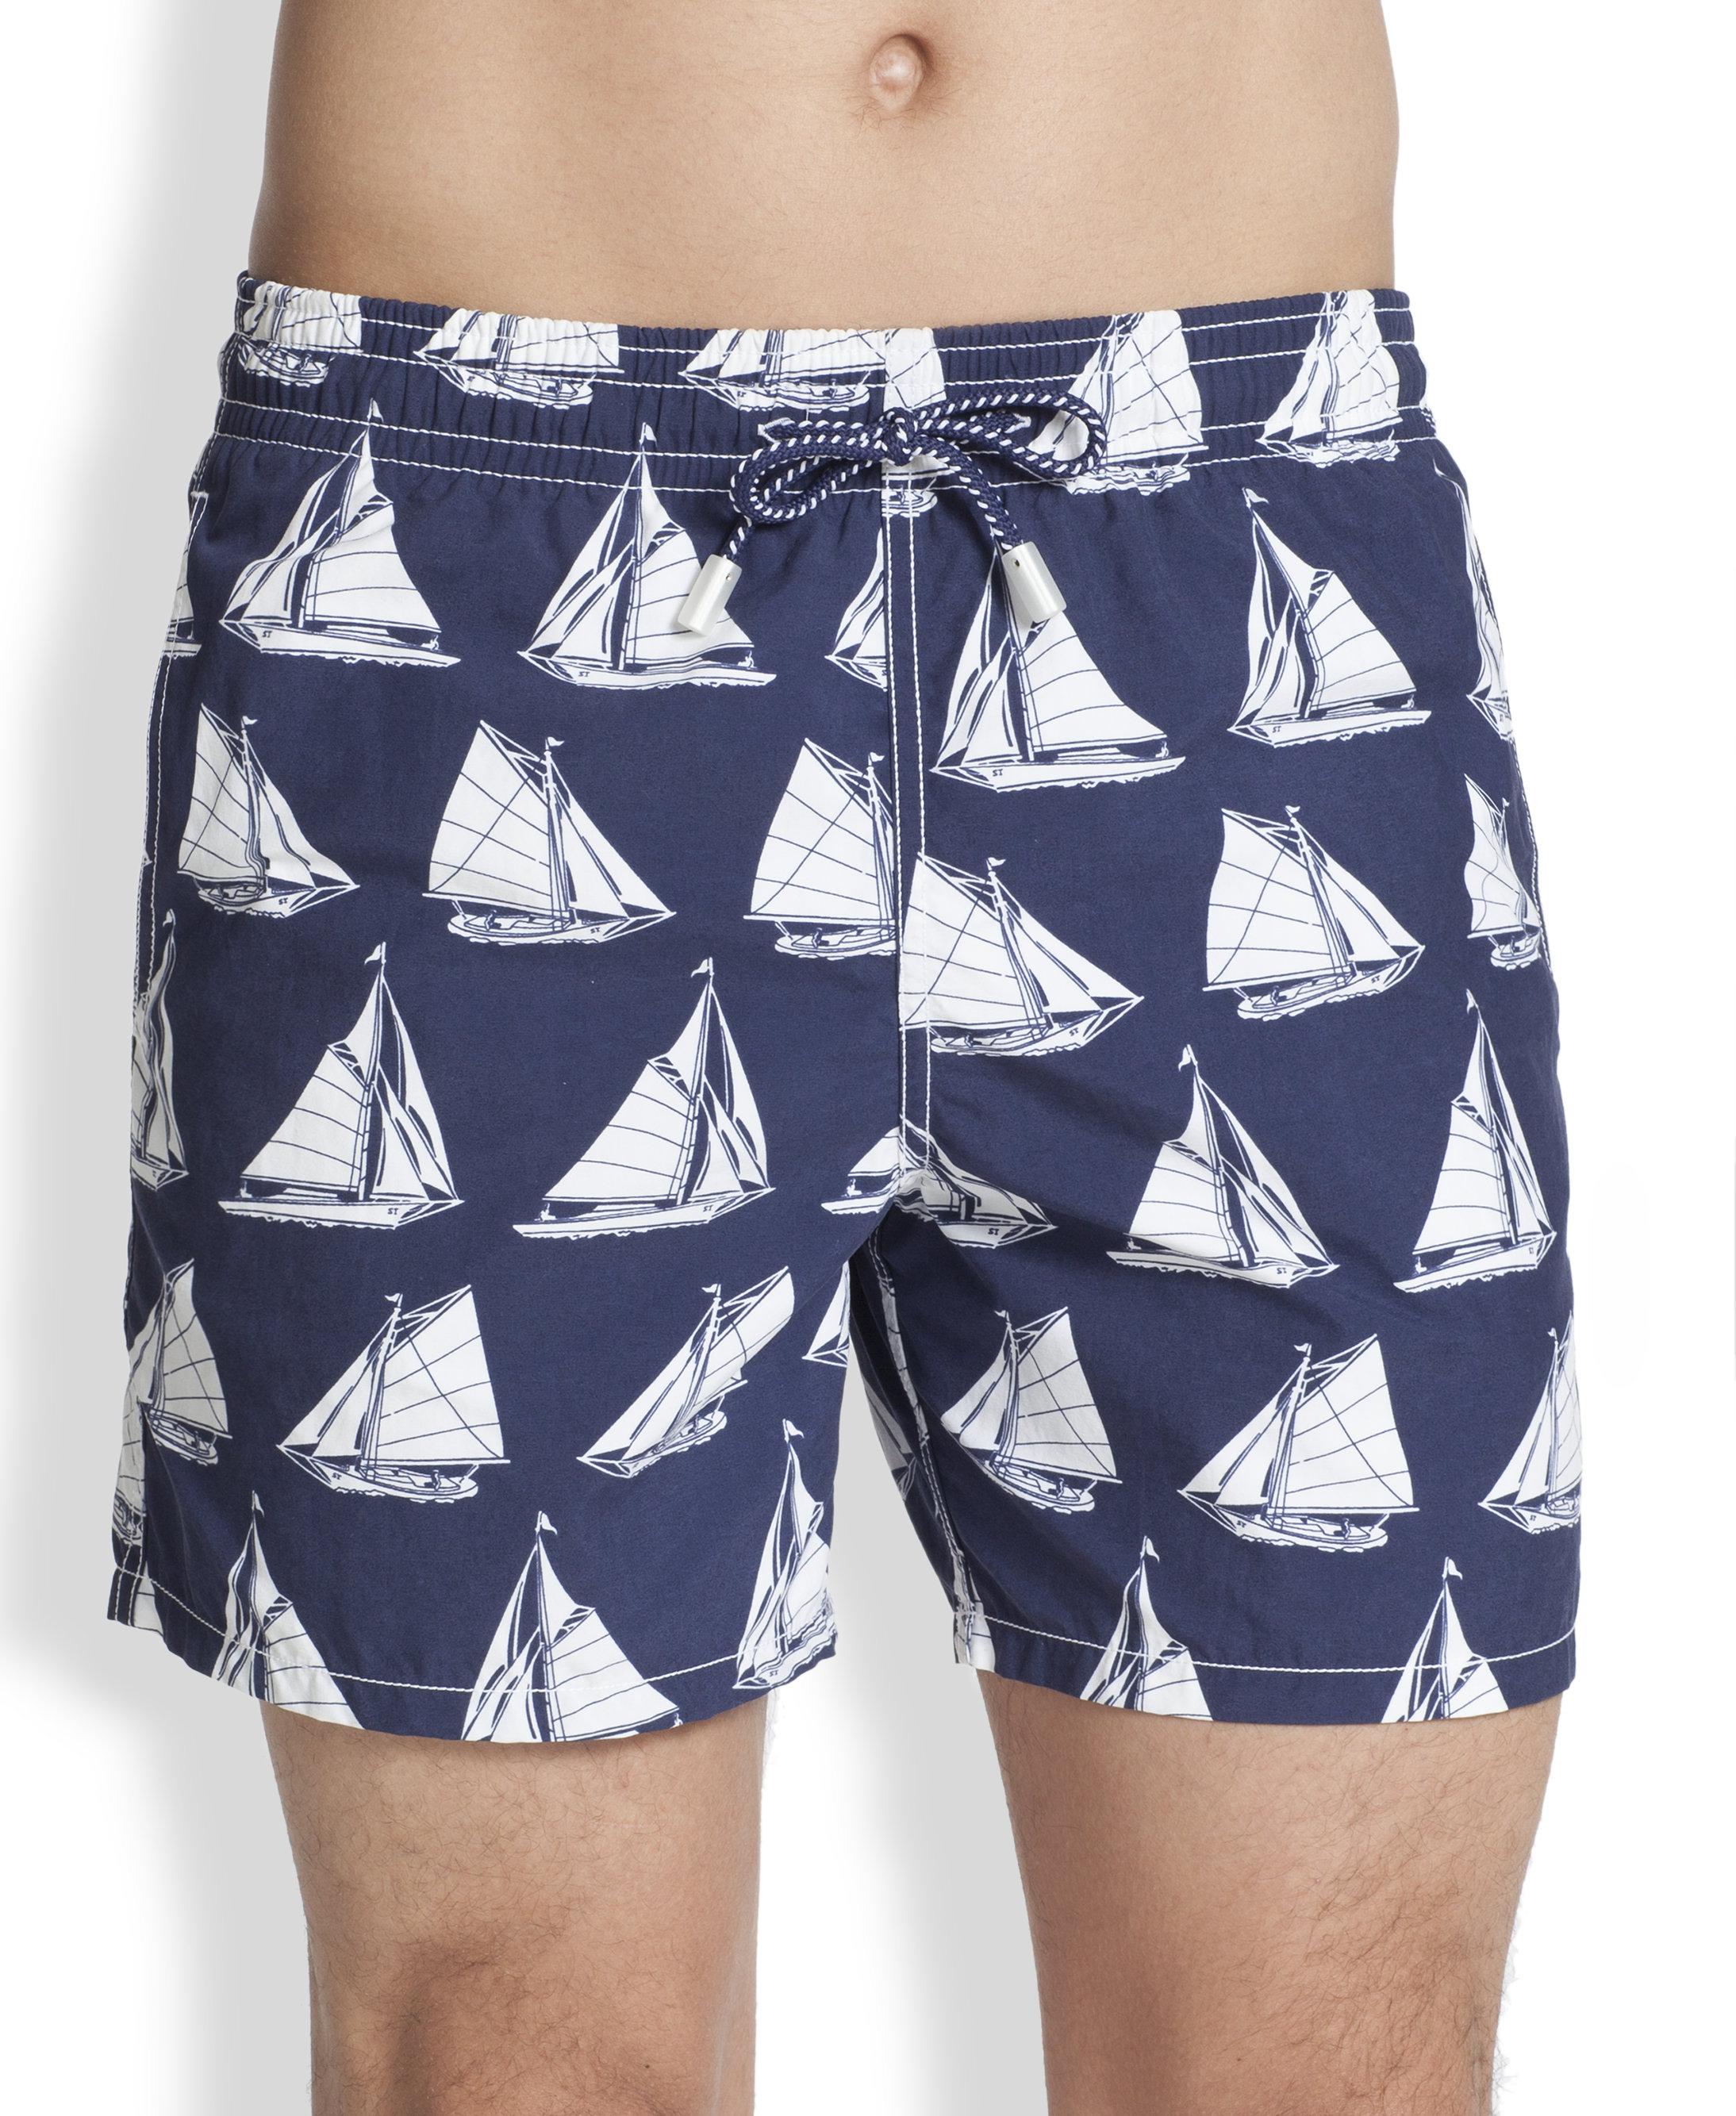 208861fcc6737 ... Blue Swim Trunks For Men: Vilebrequin Morea Navy Printed Swim Shorts In  Blue